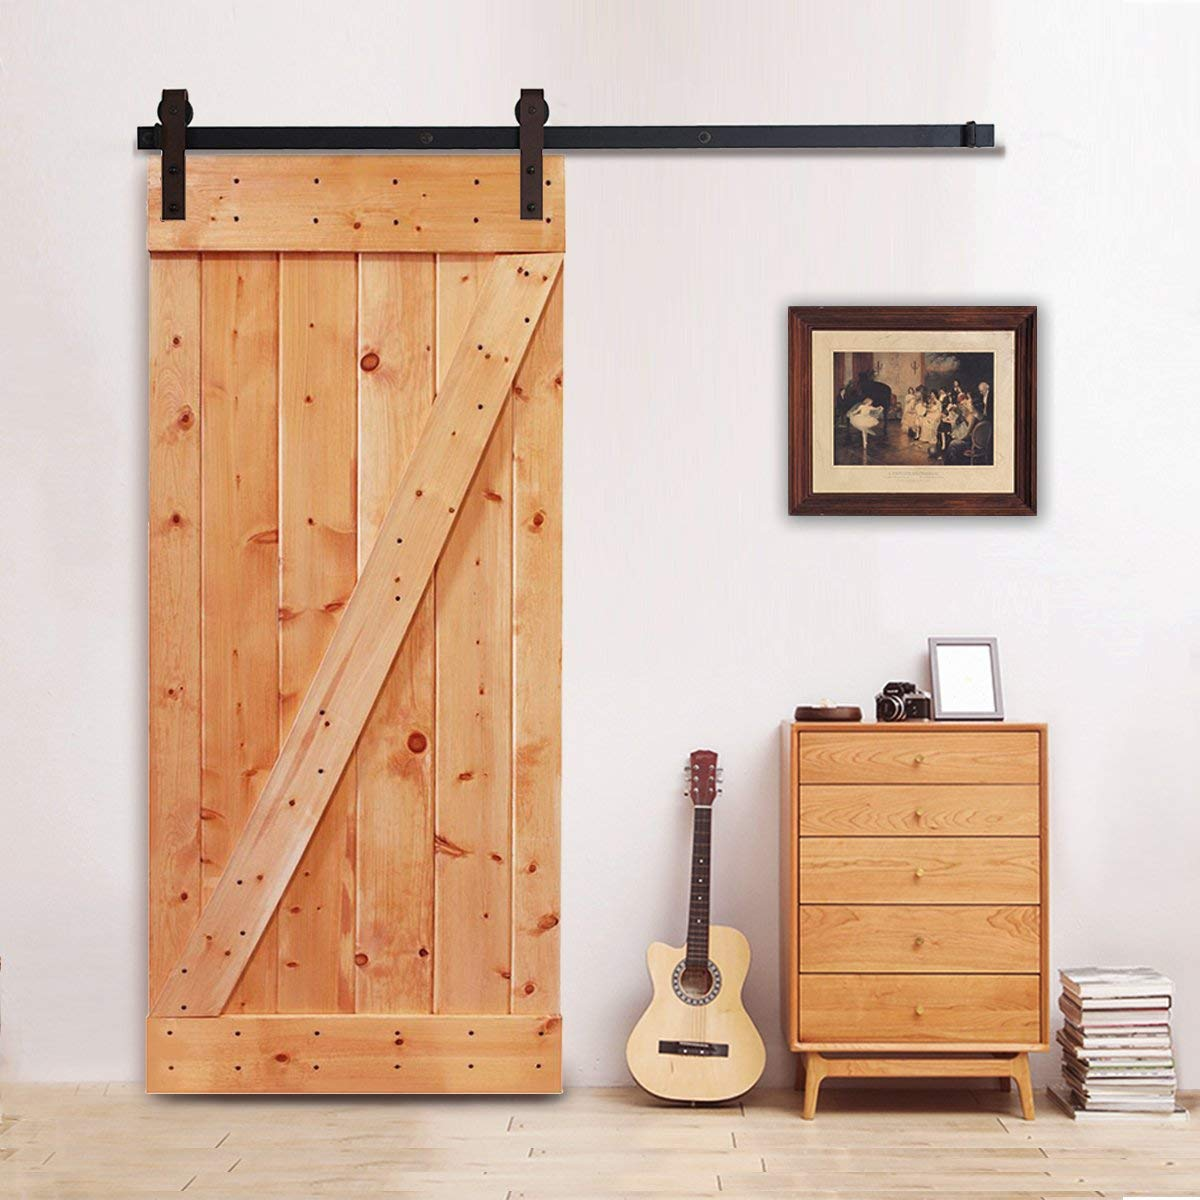 6.6 Feet Sliding Barn Door Hardware Set Superior Quality Track Kit Antique Style One-Piece Rail (Brown)